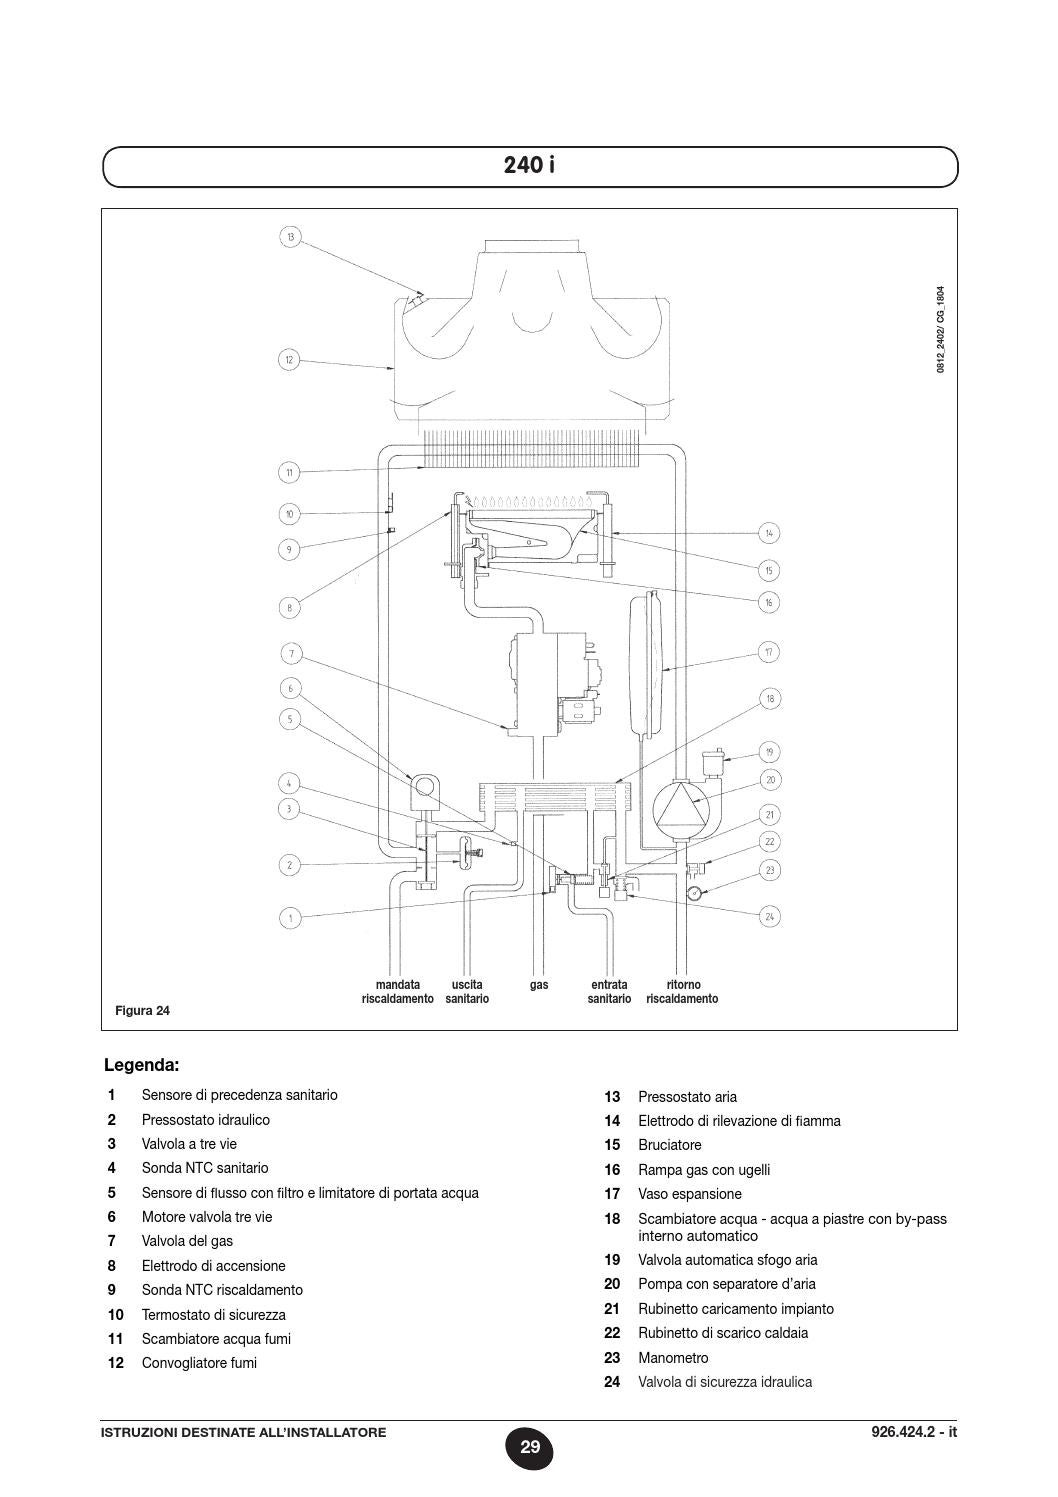 Manuale luna 3 baxi by baxi spa issuu for Termostato baxi istruzioni